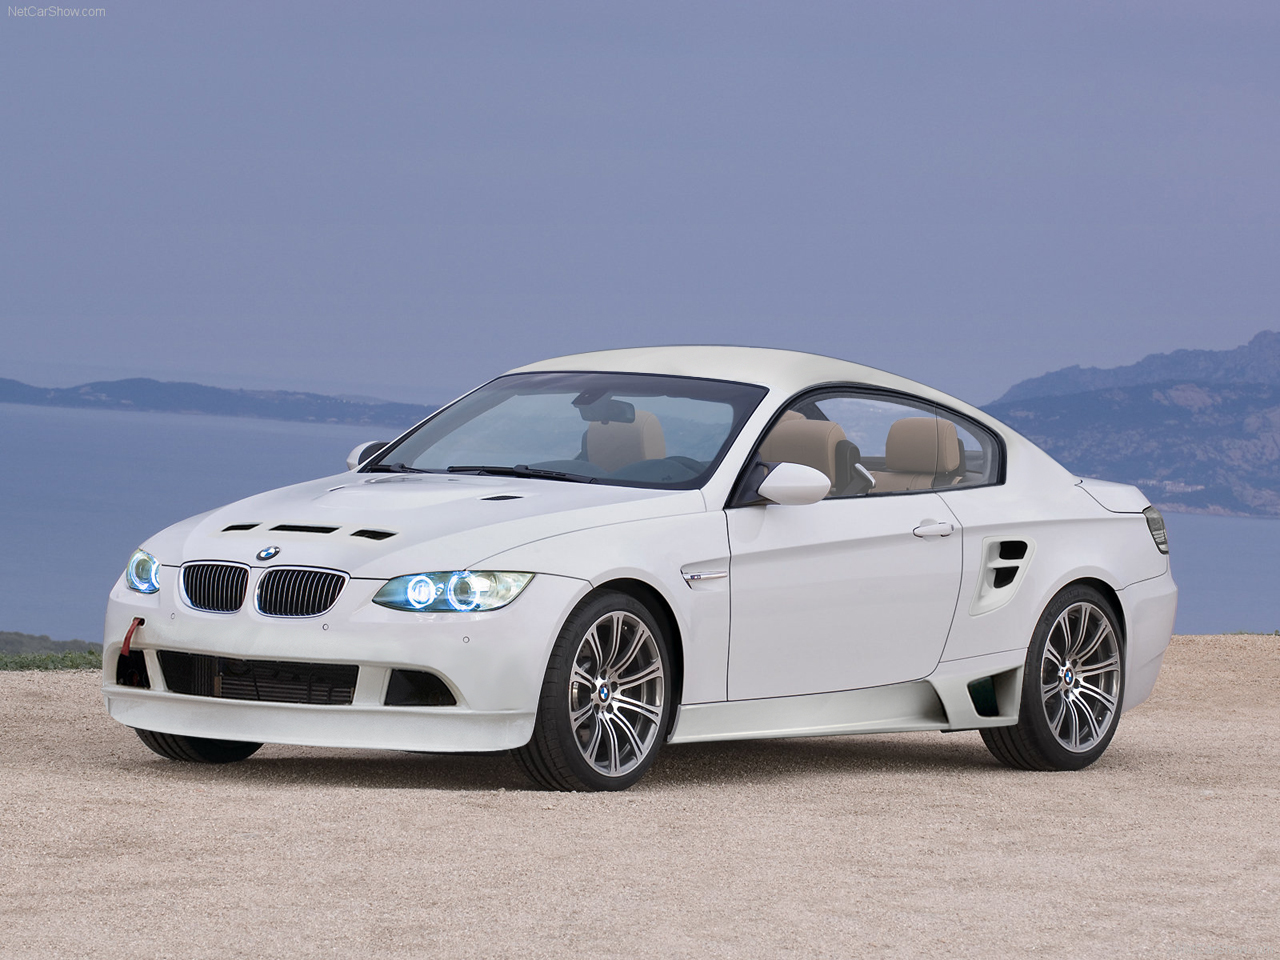 BMW M3 Convertible: